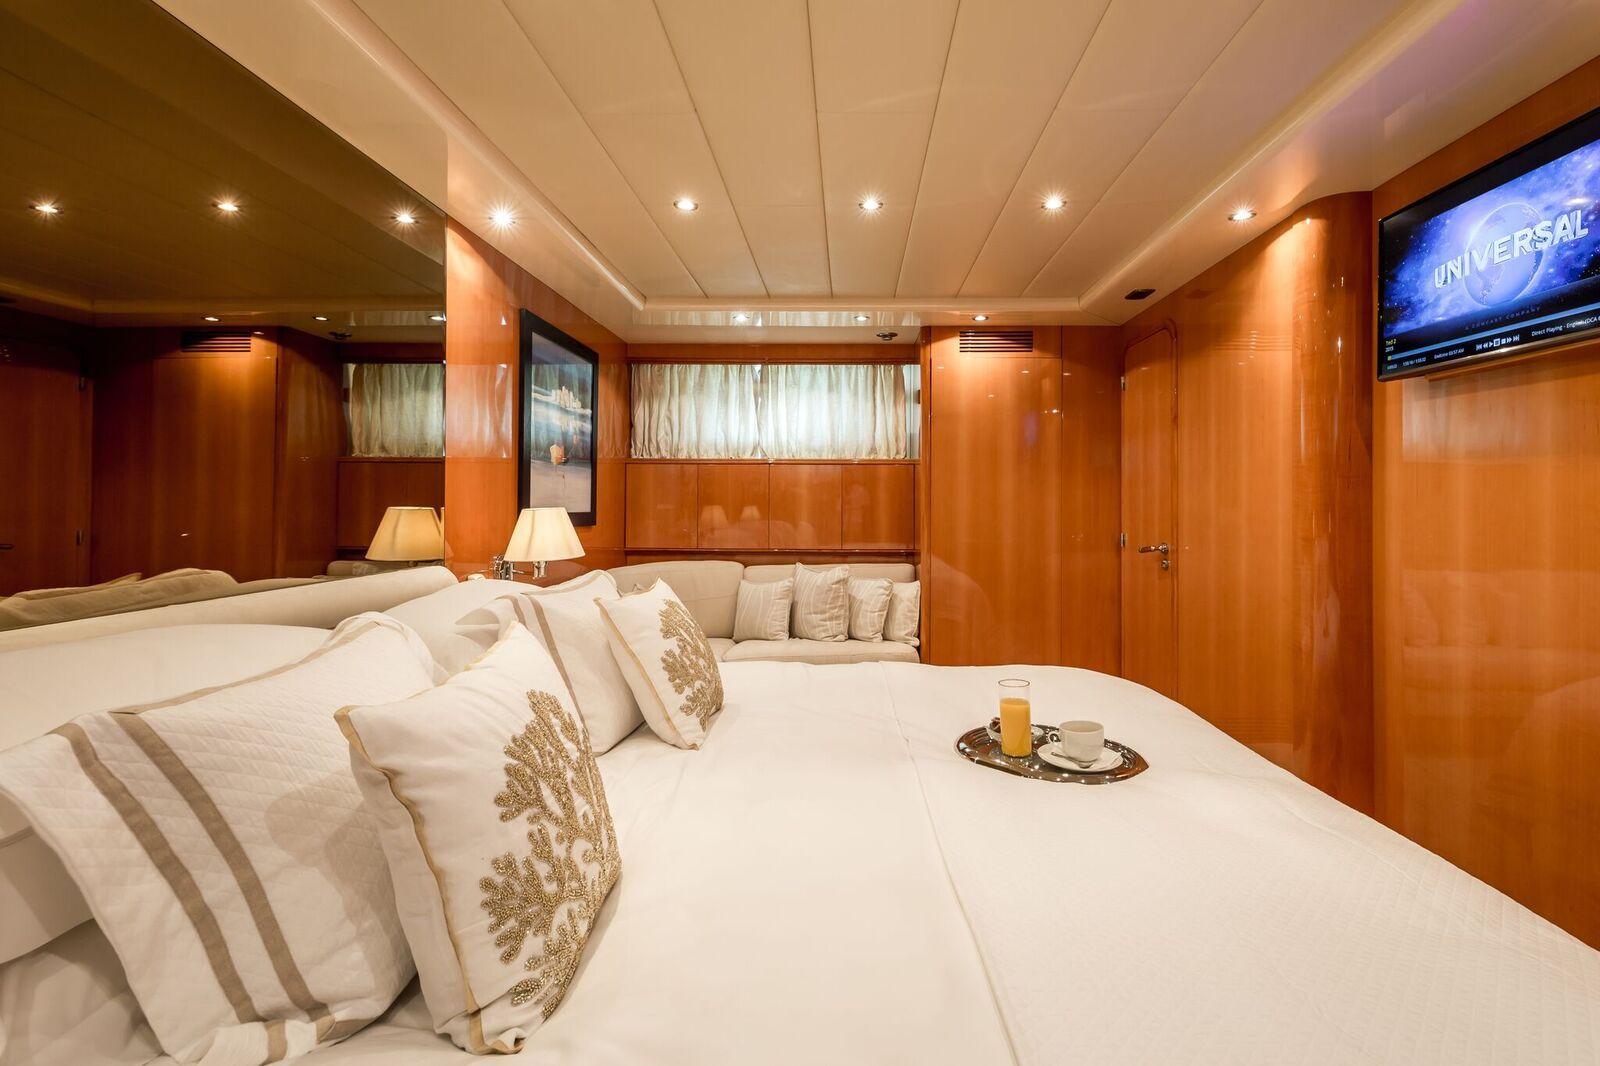 INDULGENCE OF POOLE Mangusta 86 Luxury Superyacht Main Cabin